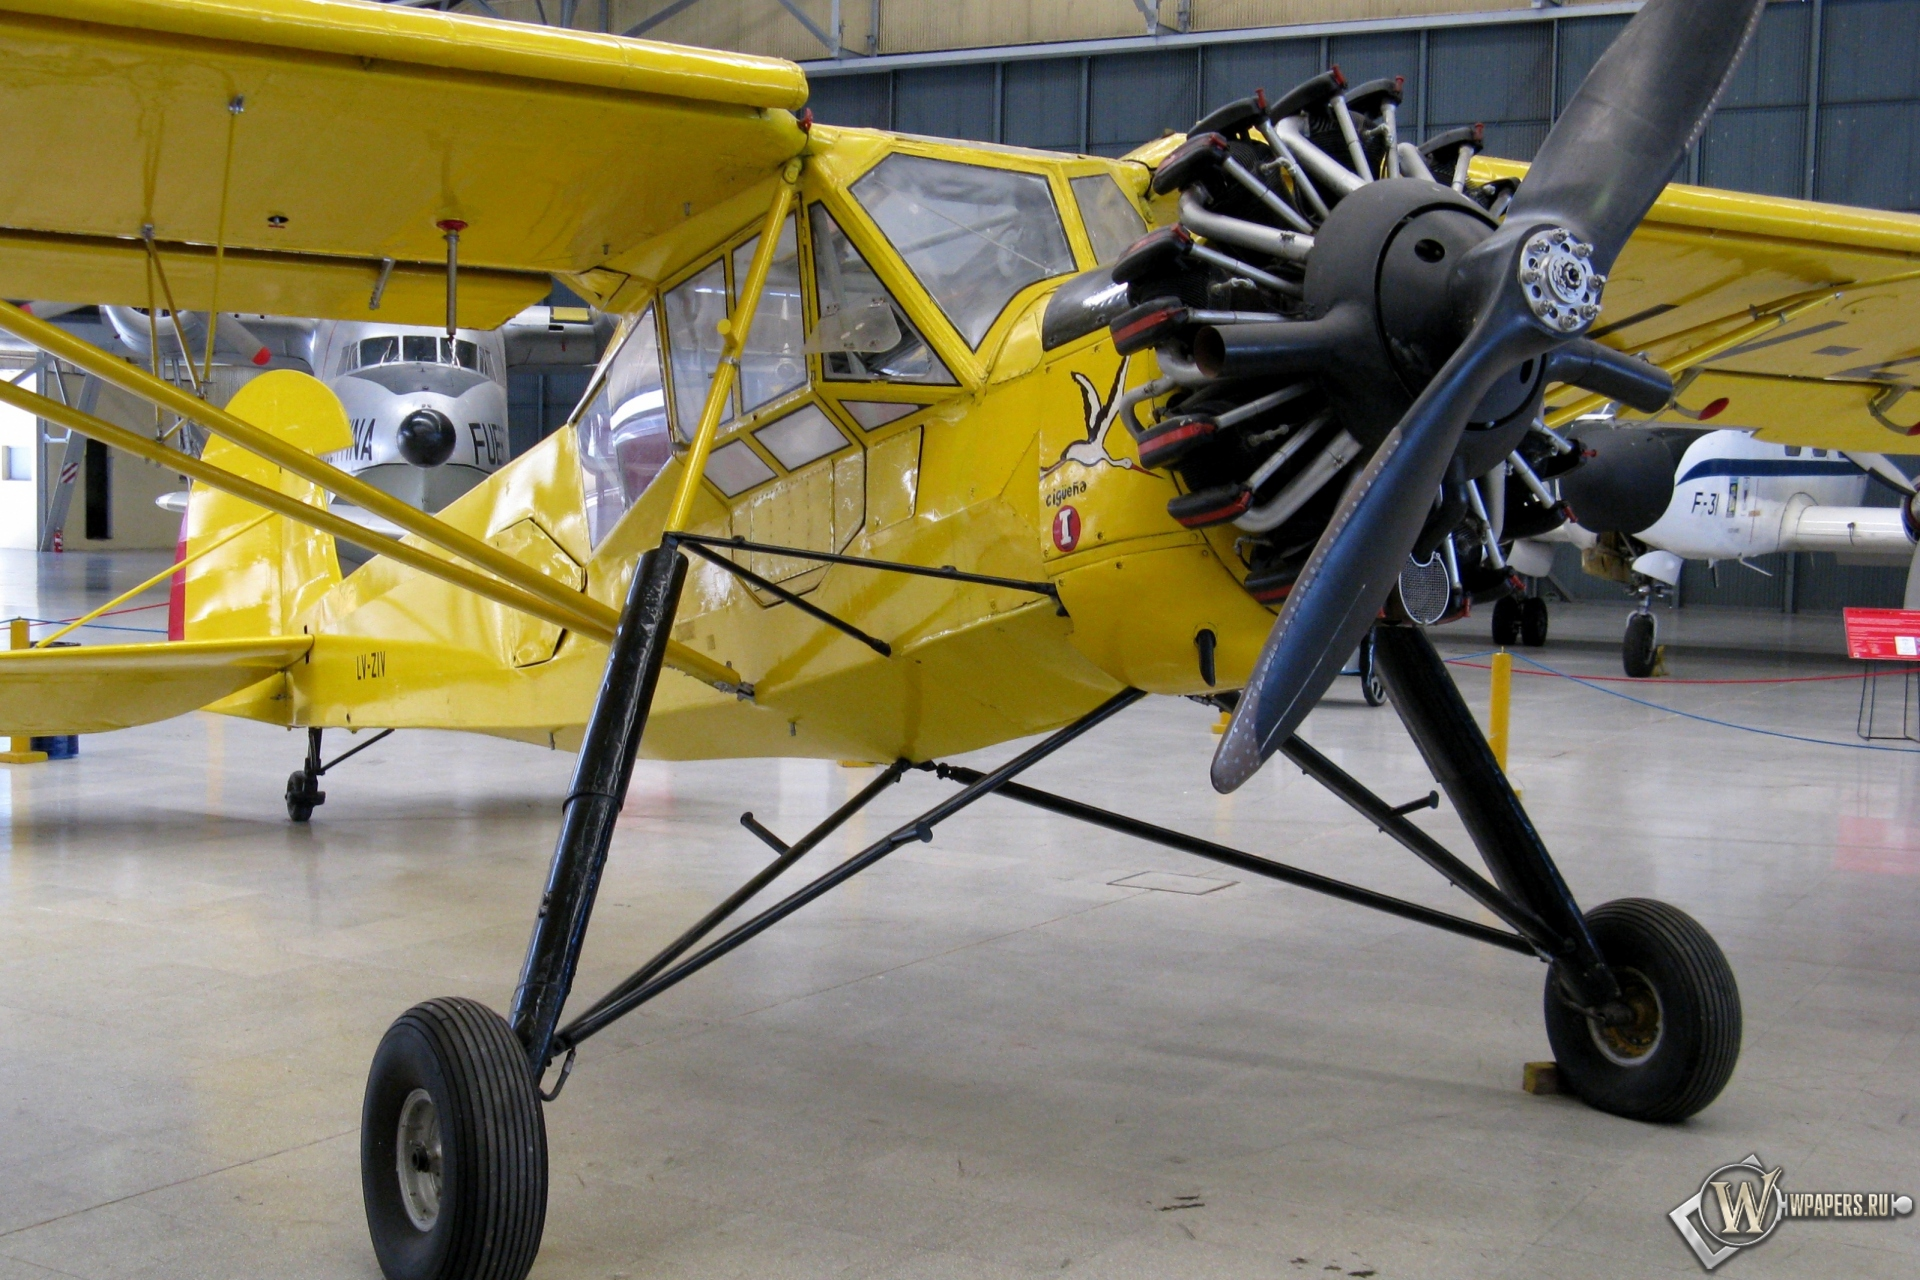 Fieseler Storch Fi-156 1920x1280